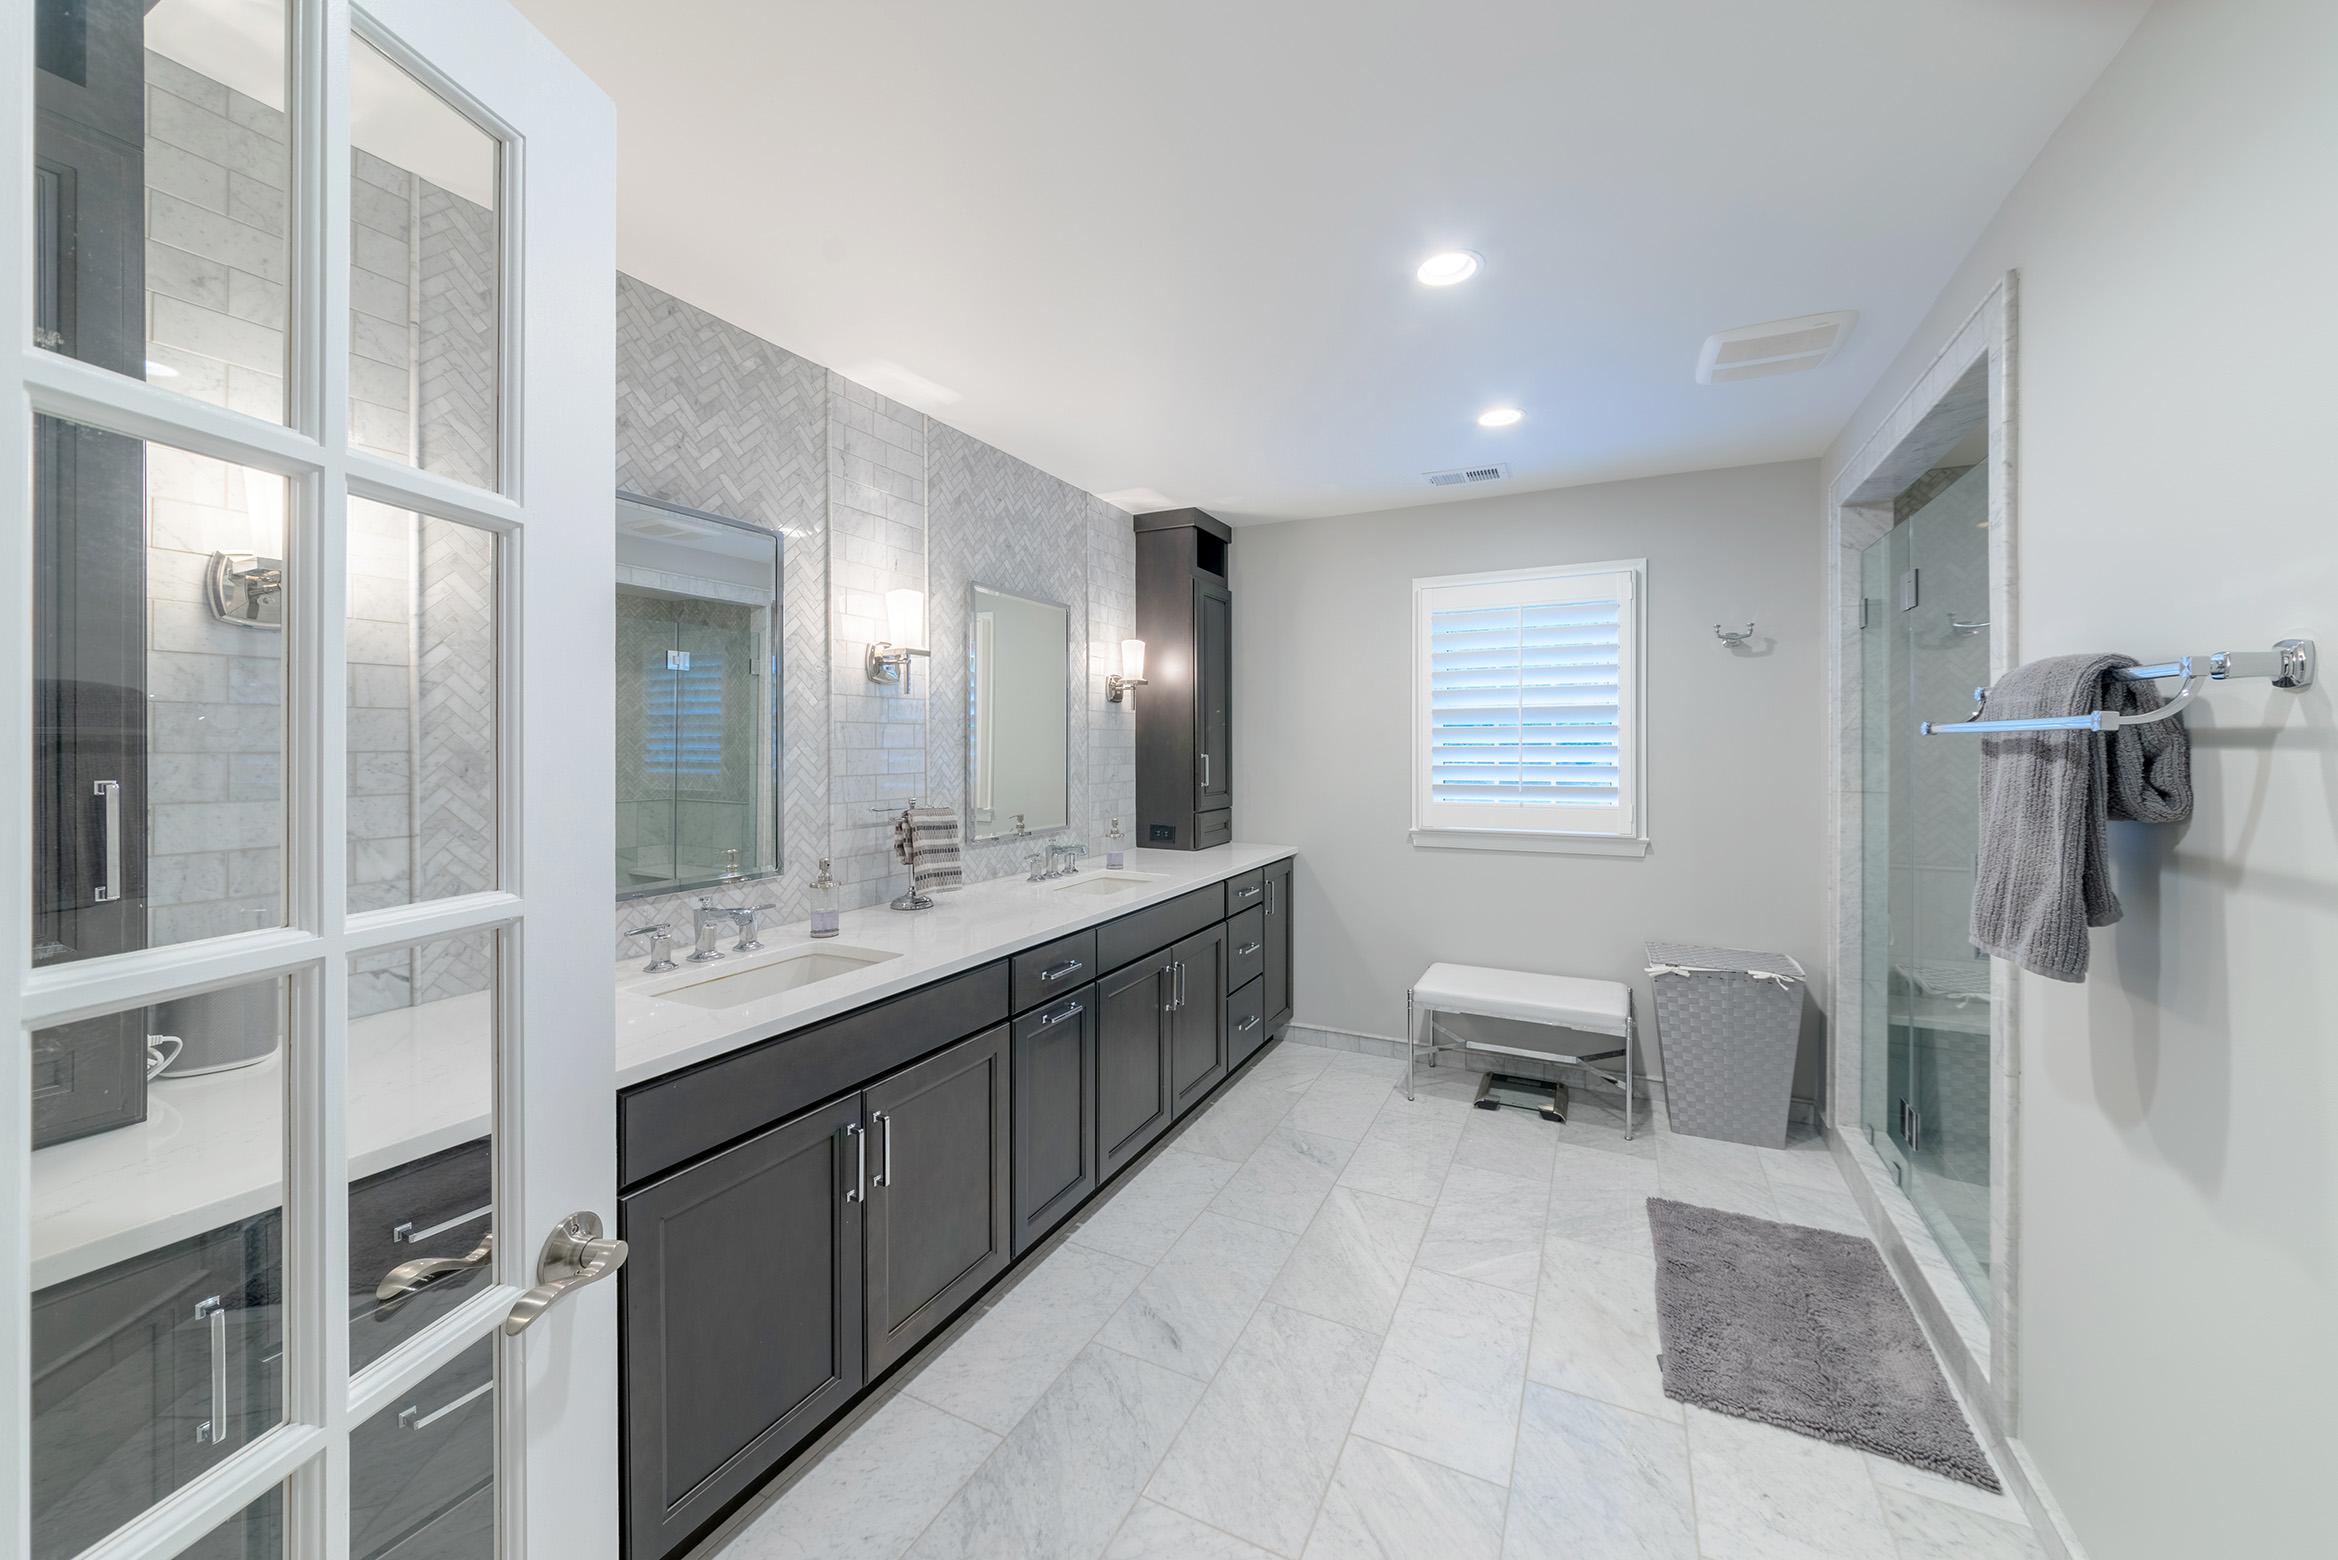 bathroom remodeling northern virginia,bathroom renovation,bathroom design, nothern virginia bathroom design, home remodeling bathroom, luxury bathroom, home bathroom renovation